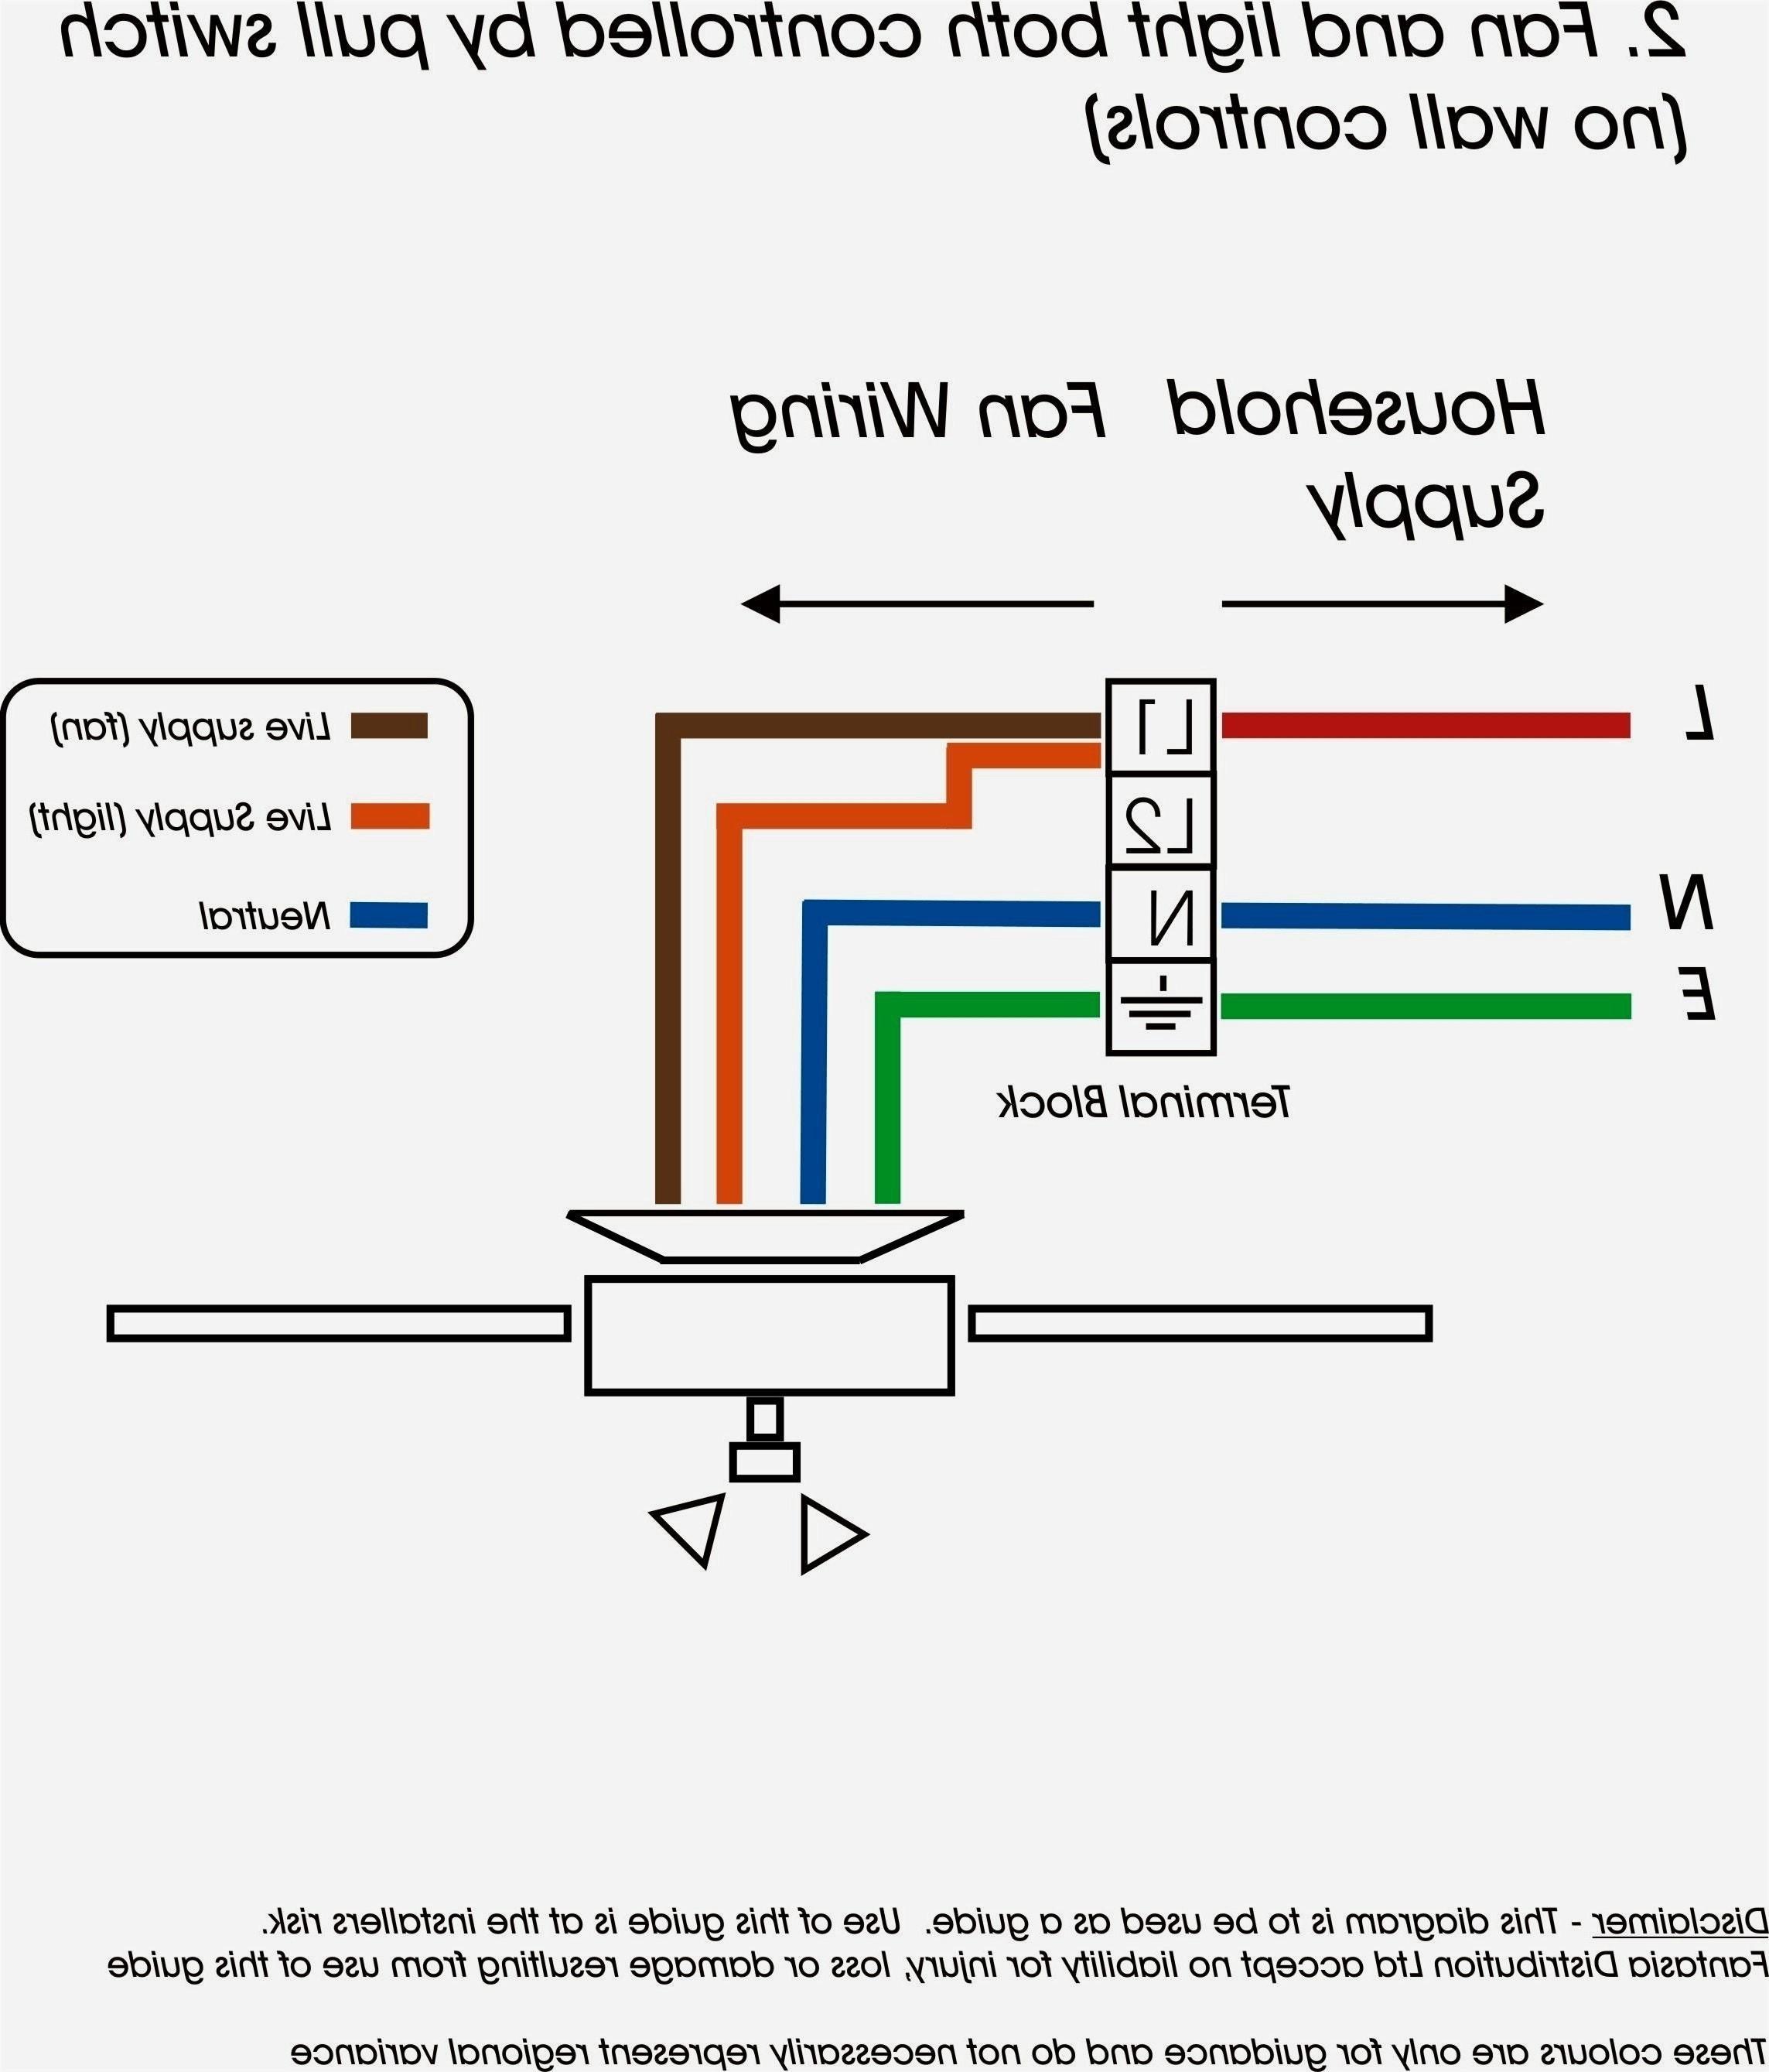 single gfci wiring diagram Download-Single Gfci Wiring Diagram New Wiring Diagram for Multiple Lights E Switch – Wiring Diagram 11-h